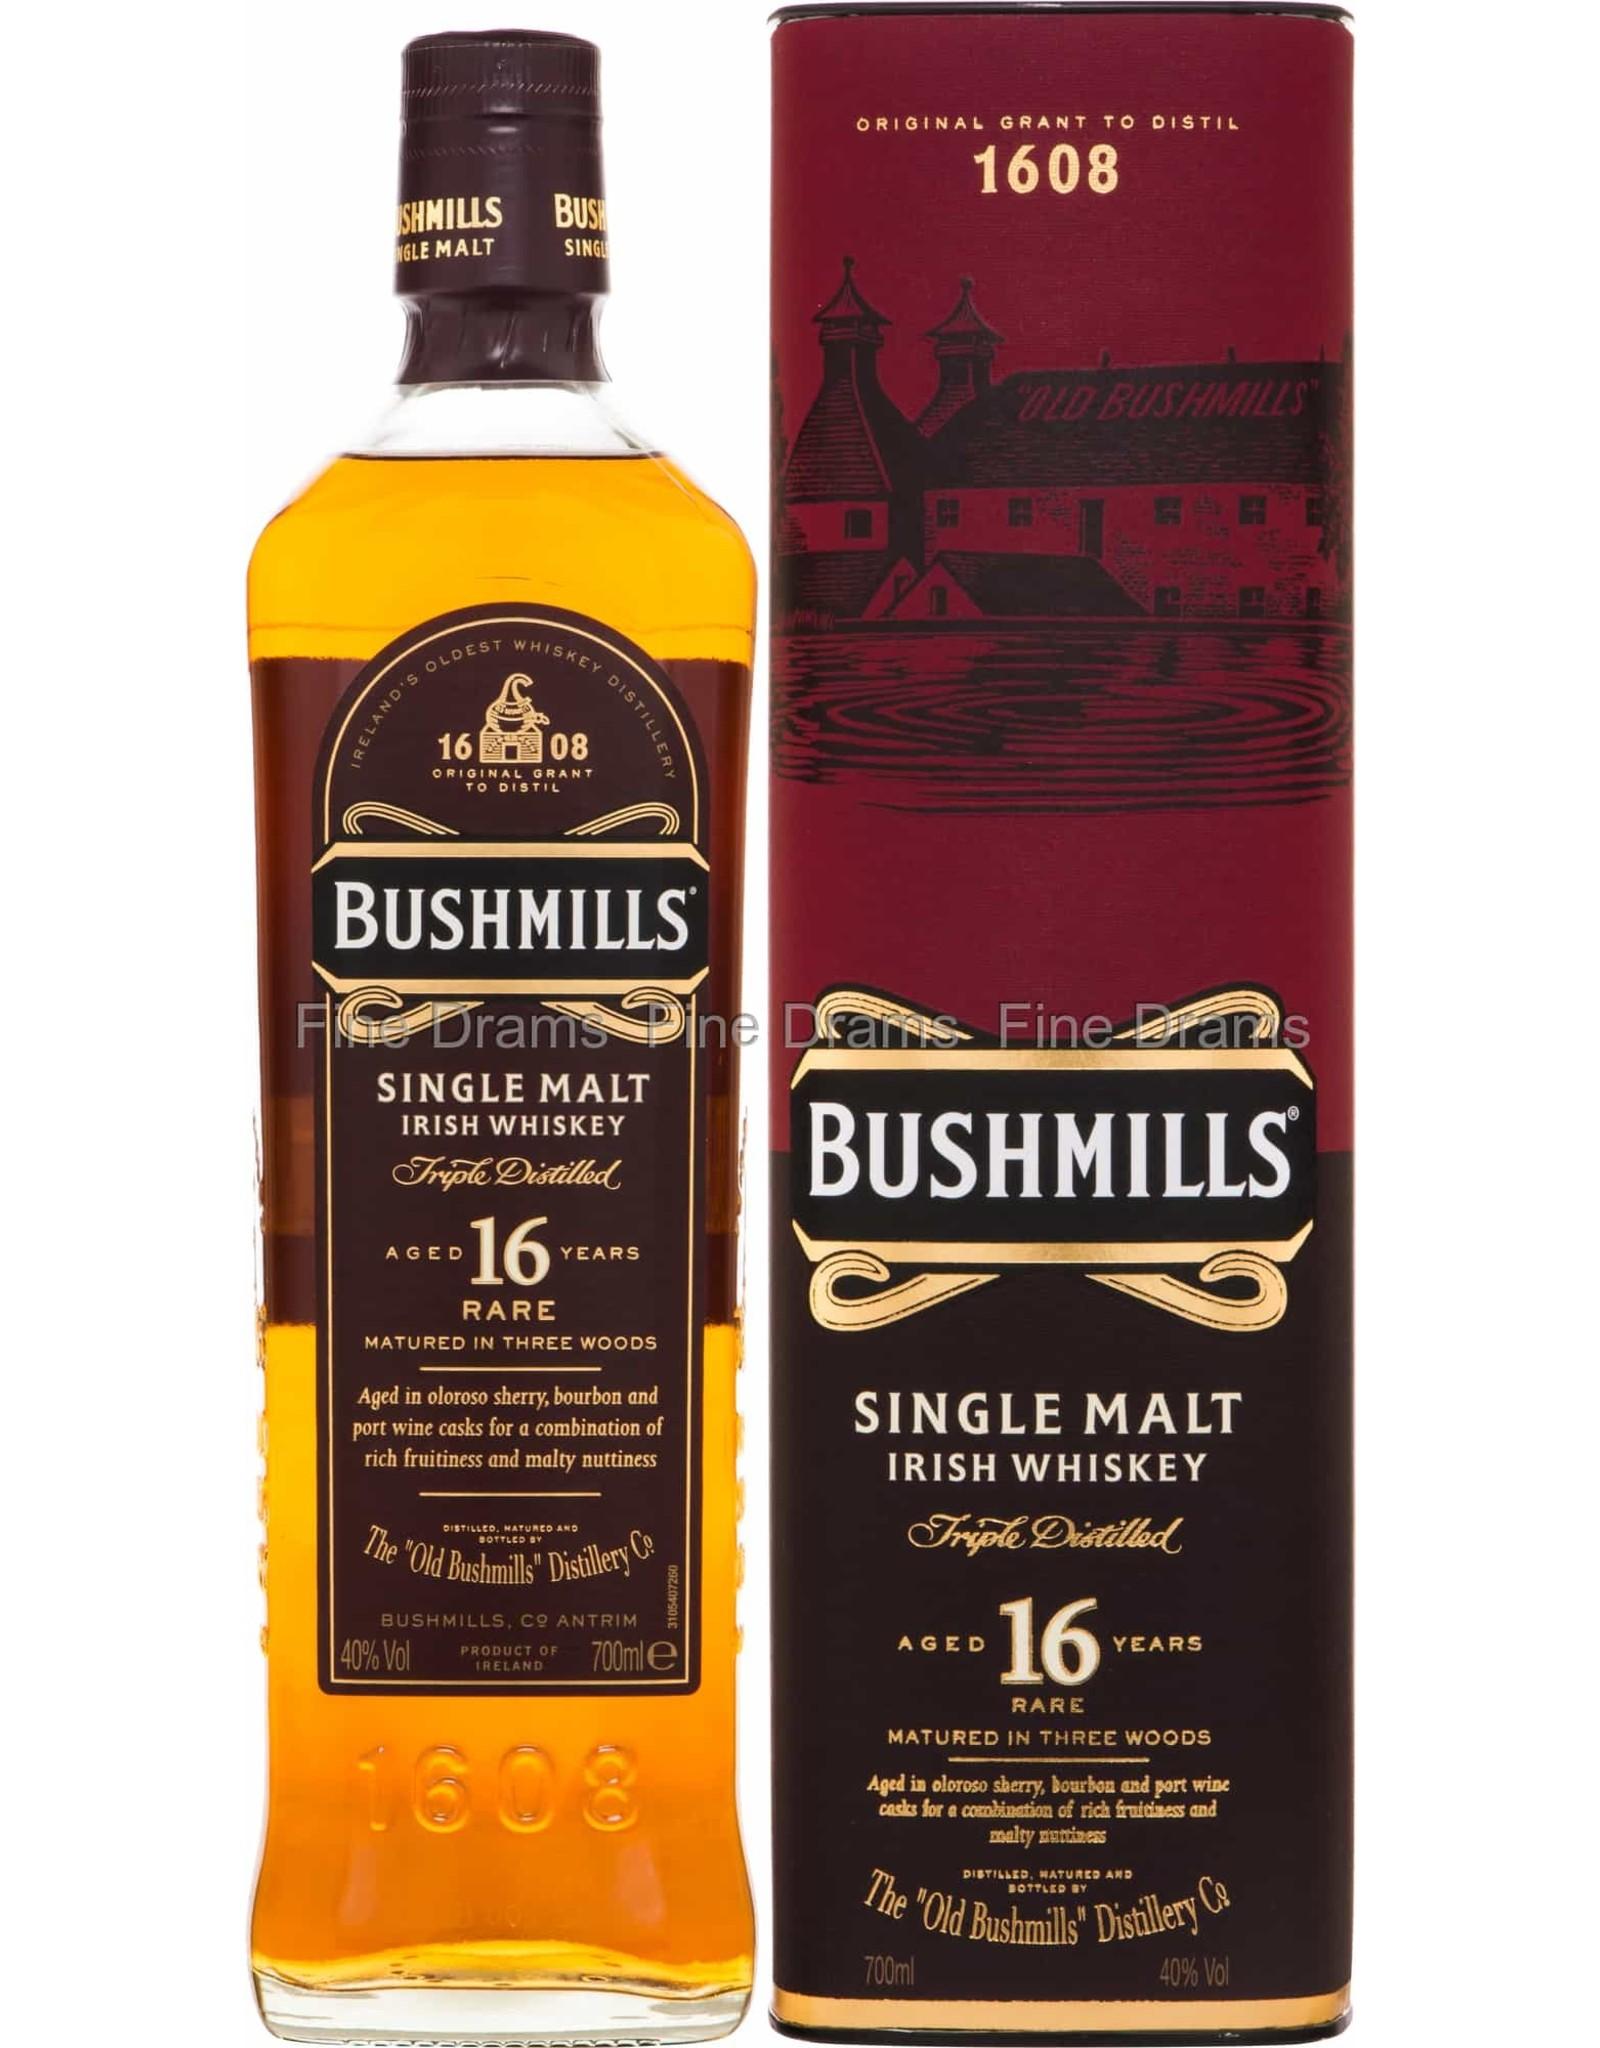 Bushmills Single Malt Irish Whiskey 16 years old